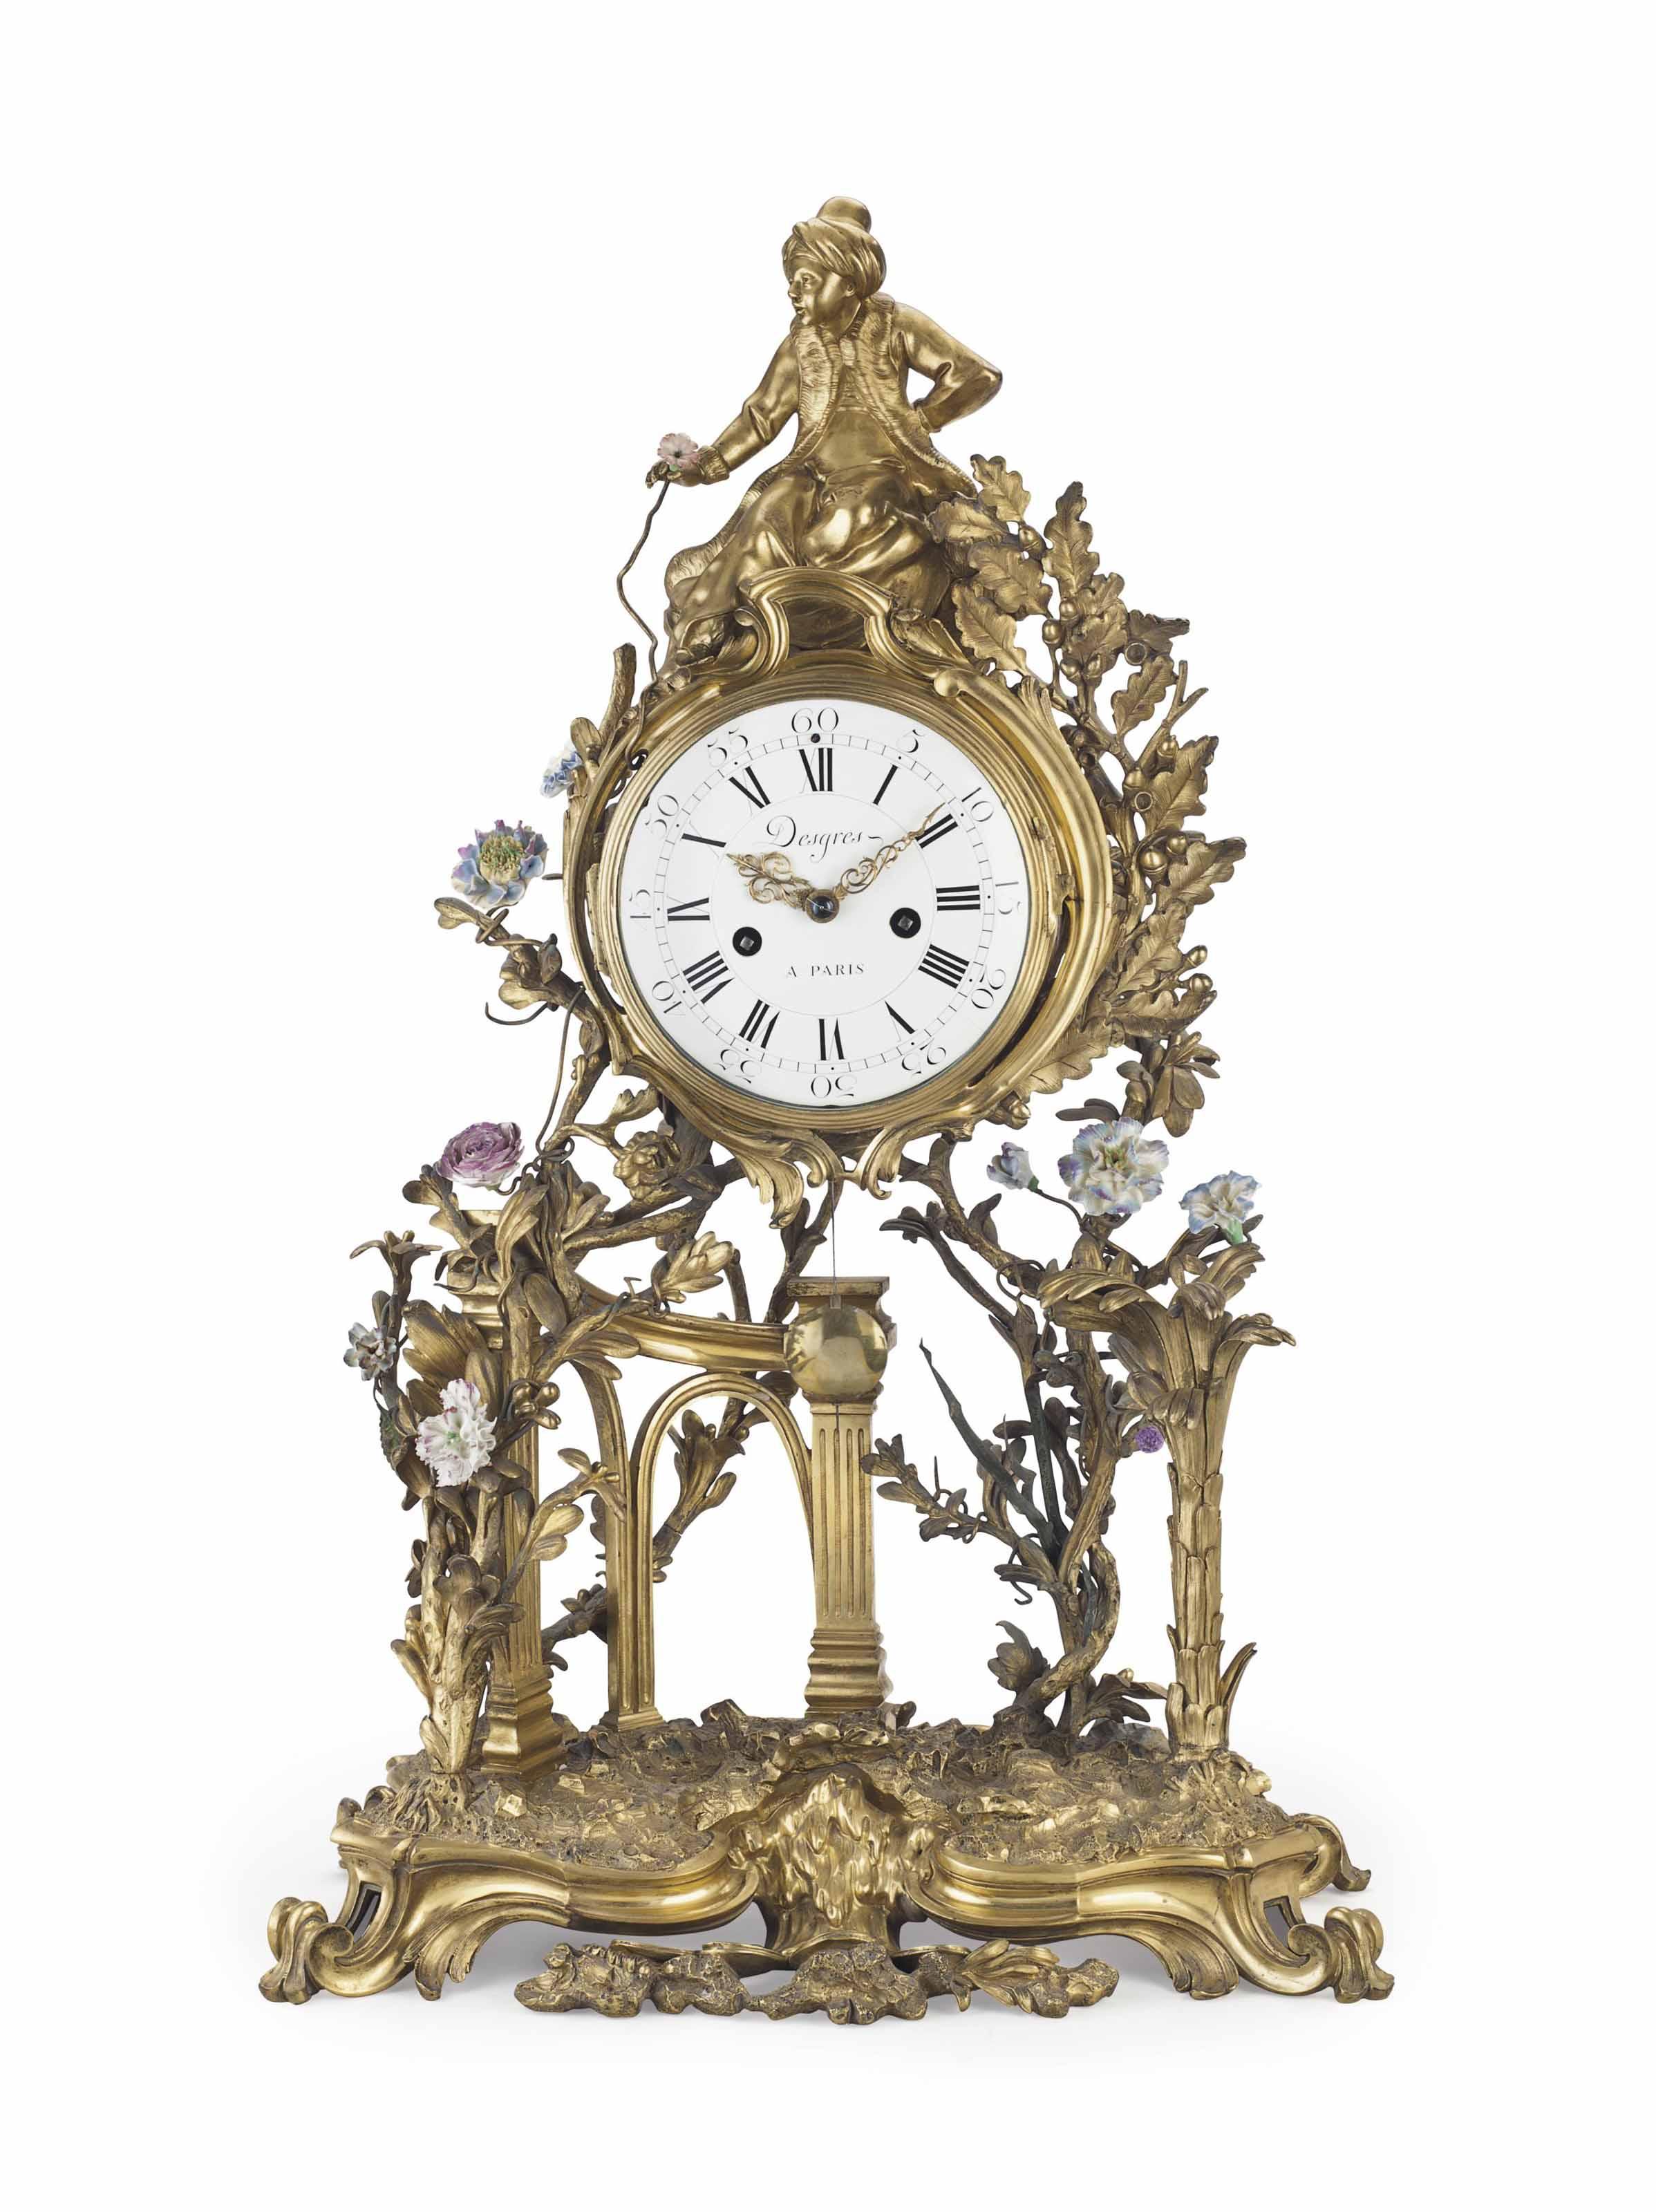 A FRENCH ORMOLU AND PORCELAIN MANTEL CLOCK,